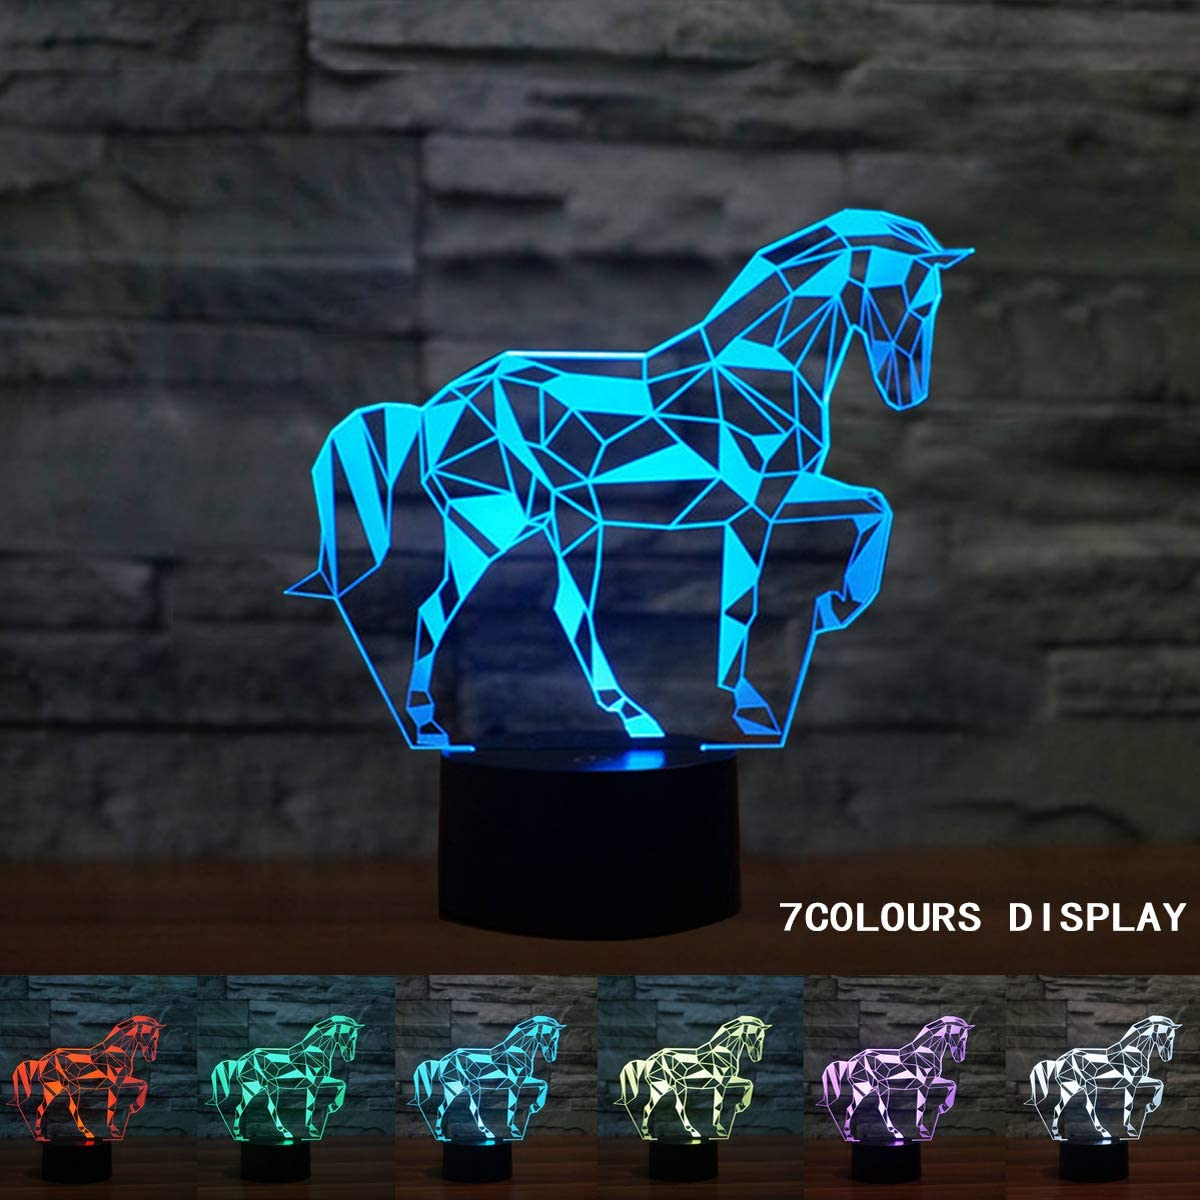 Coolzon 3D Led Lamparas de Mesilla de Noche luz Noche Infantil 7 Cambiar el Color botón táctil Caballo Lampara Noche niños Decoracion Habitacion Juvenil [Clase de eficiencia energética A+]